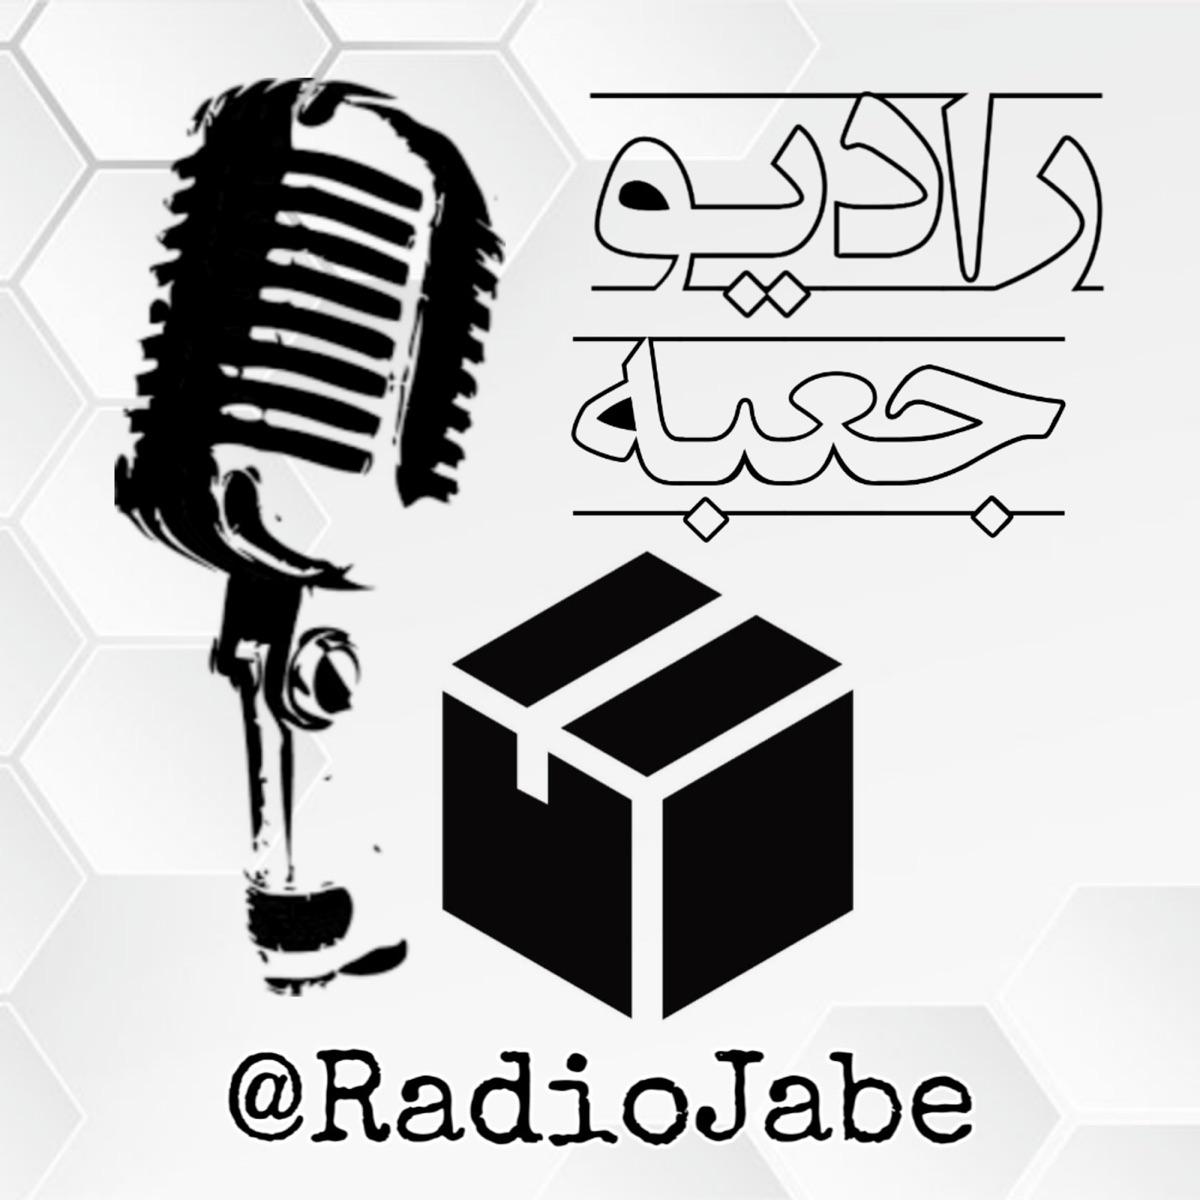 Radio Jabe | پادکست فارسی رادیو جعبه